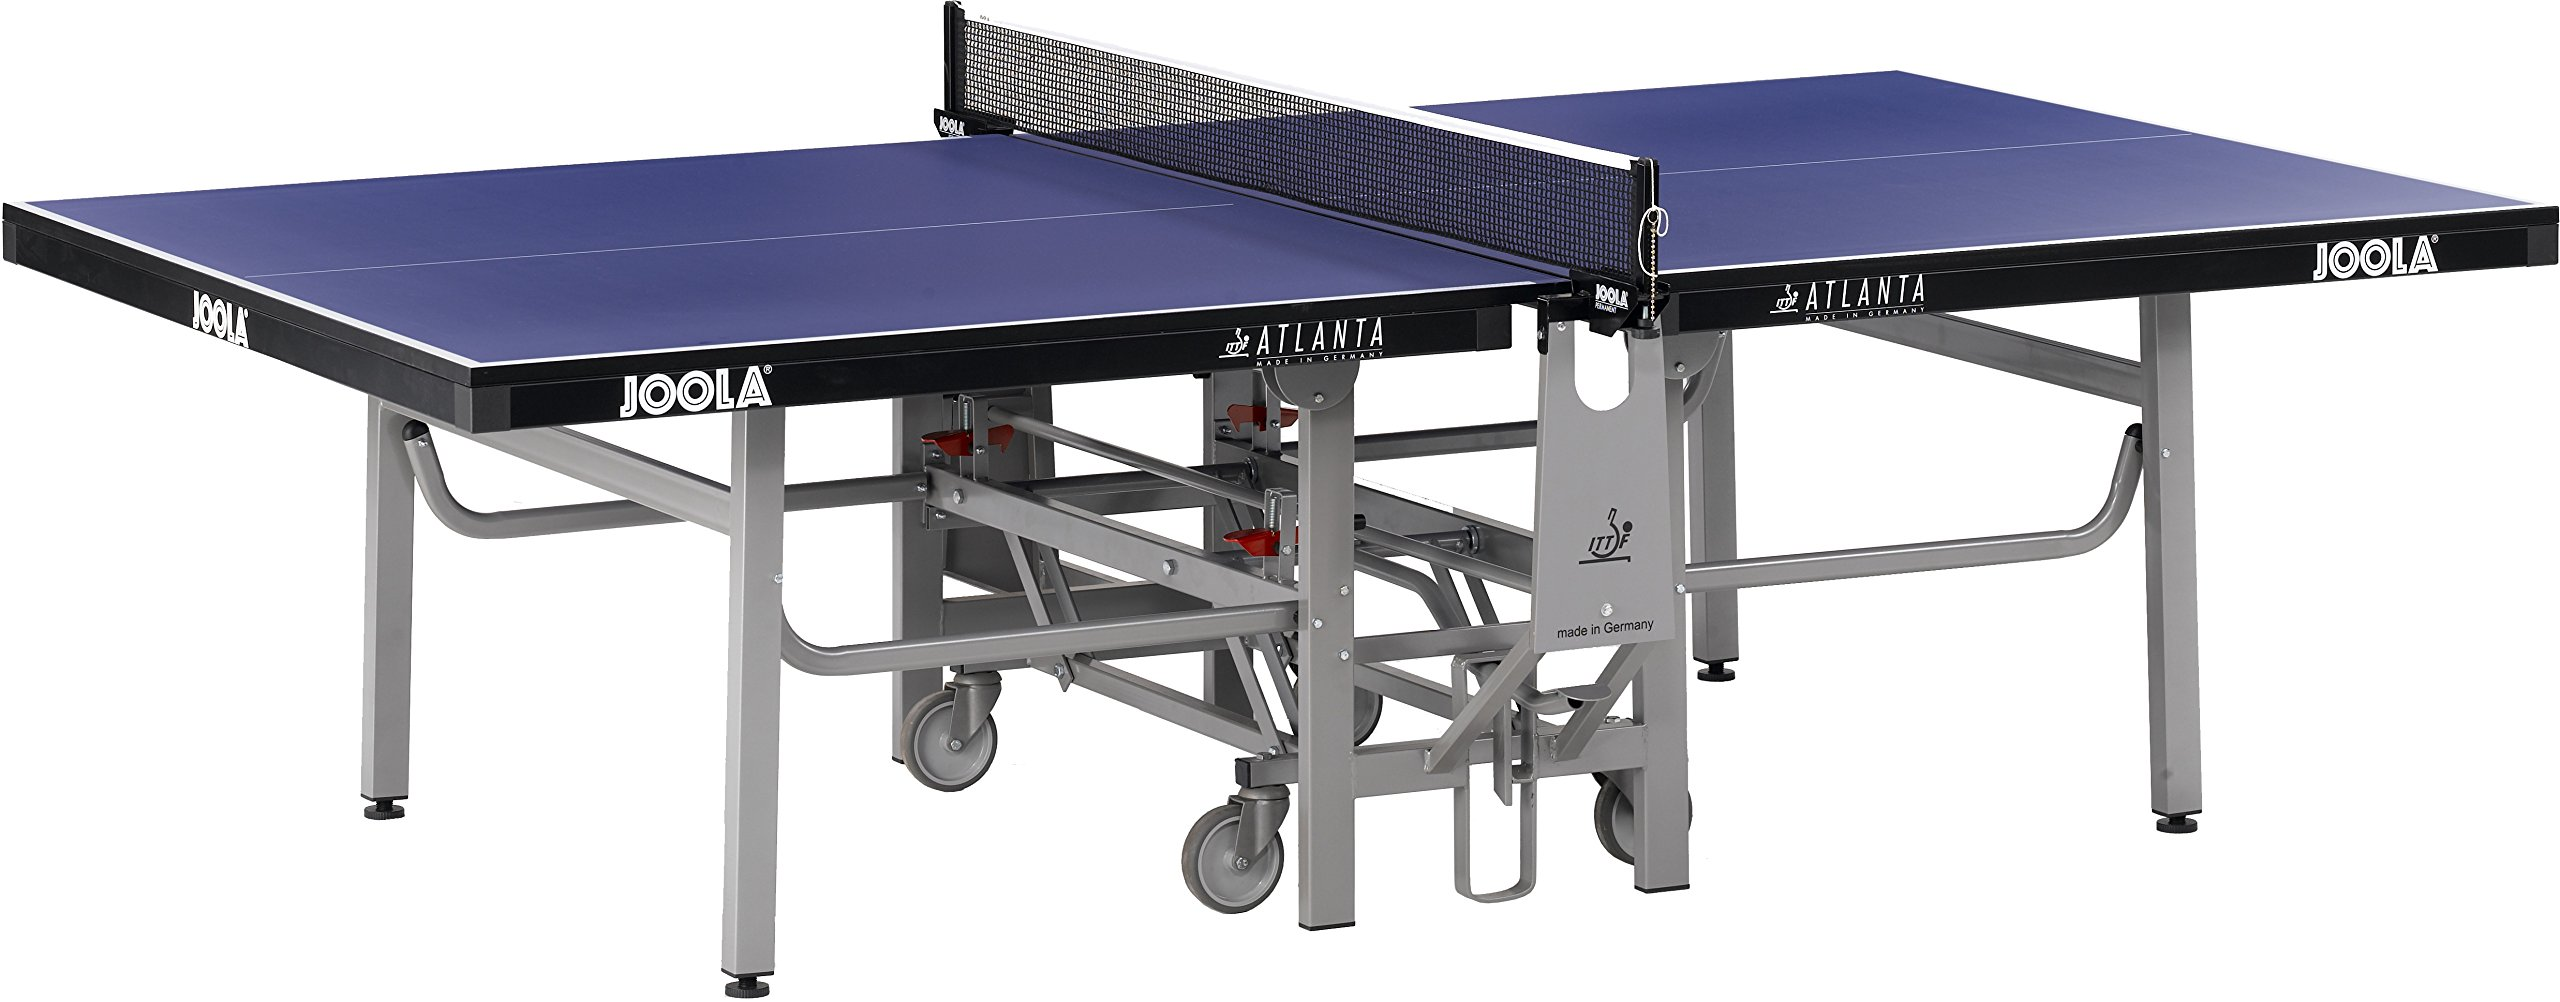 JOOLA Atlanta Olympic Table Tennis Table